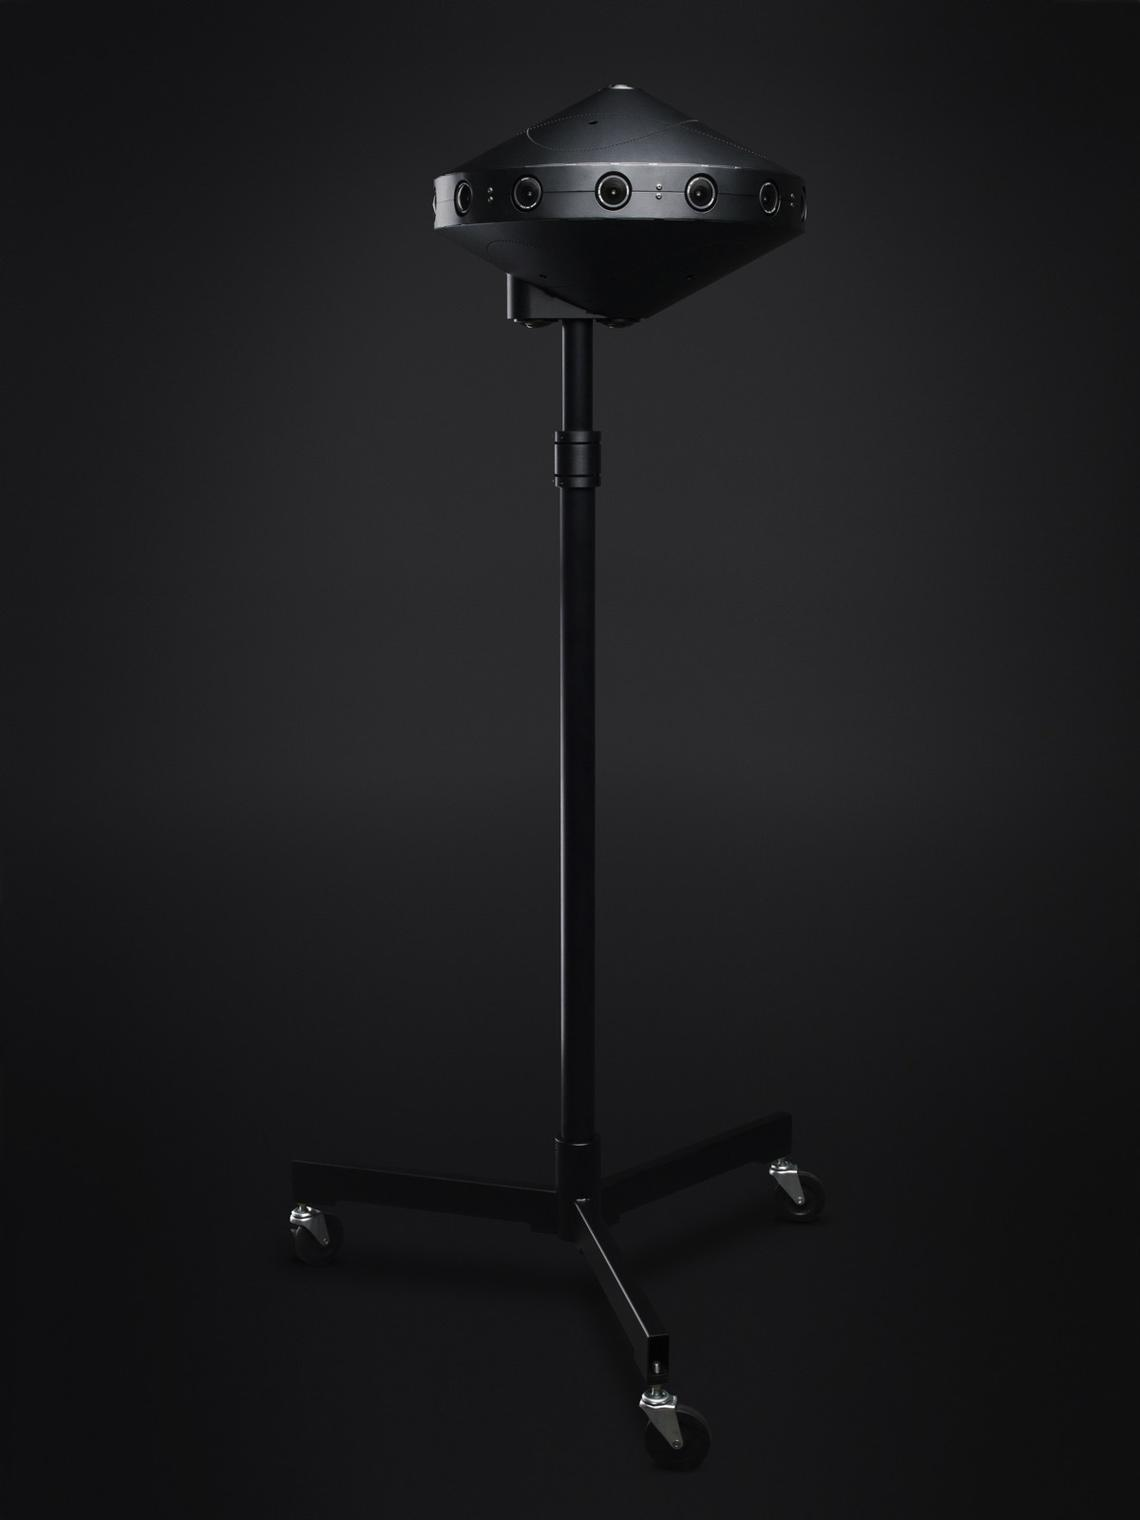 Surround360 caméra 360 degrés Facebook